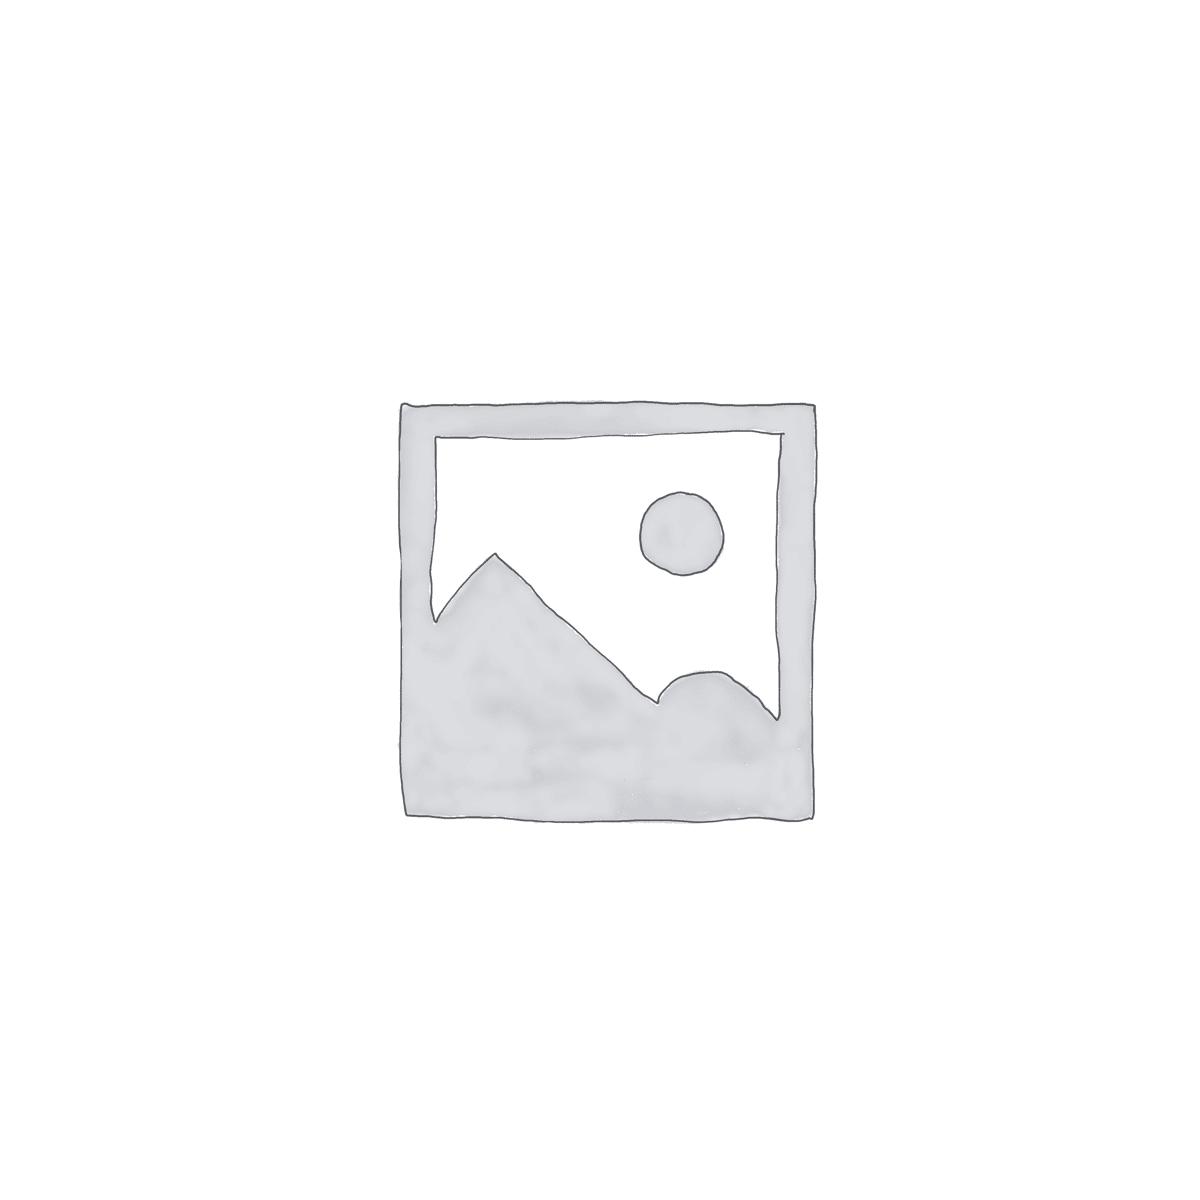 La Tendetta de Noé woocommerce-placeholder INICIO